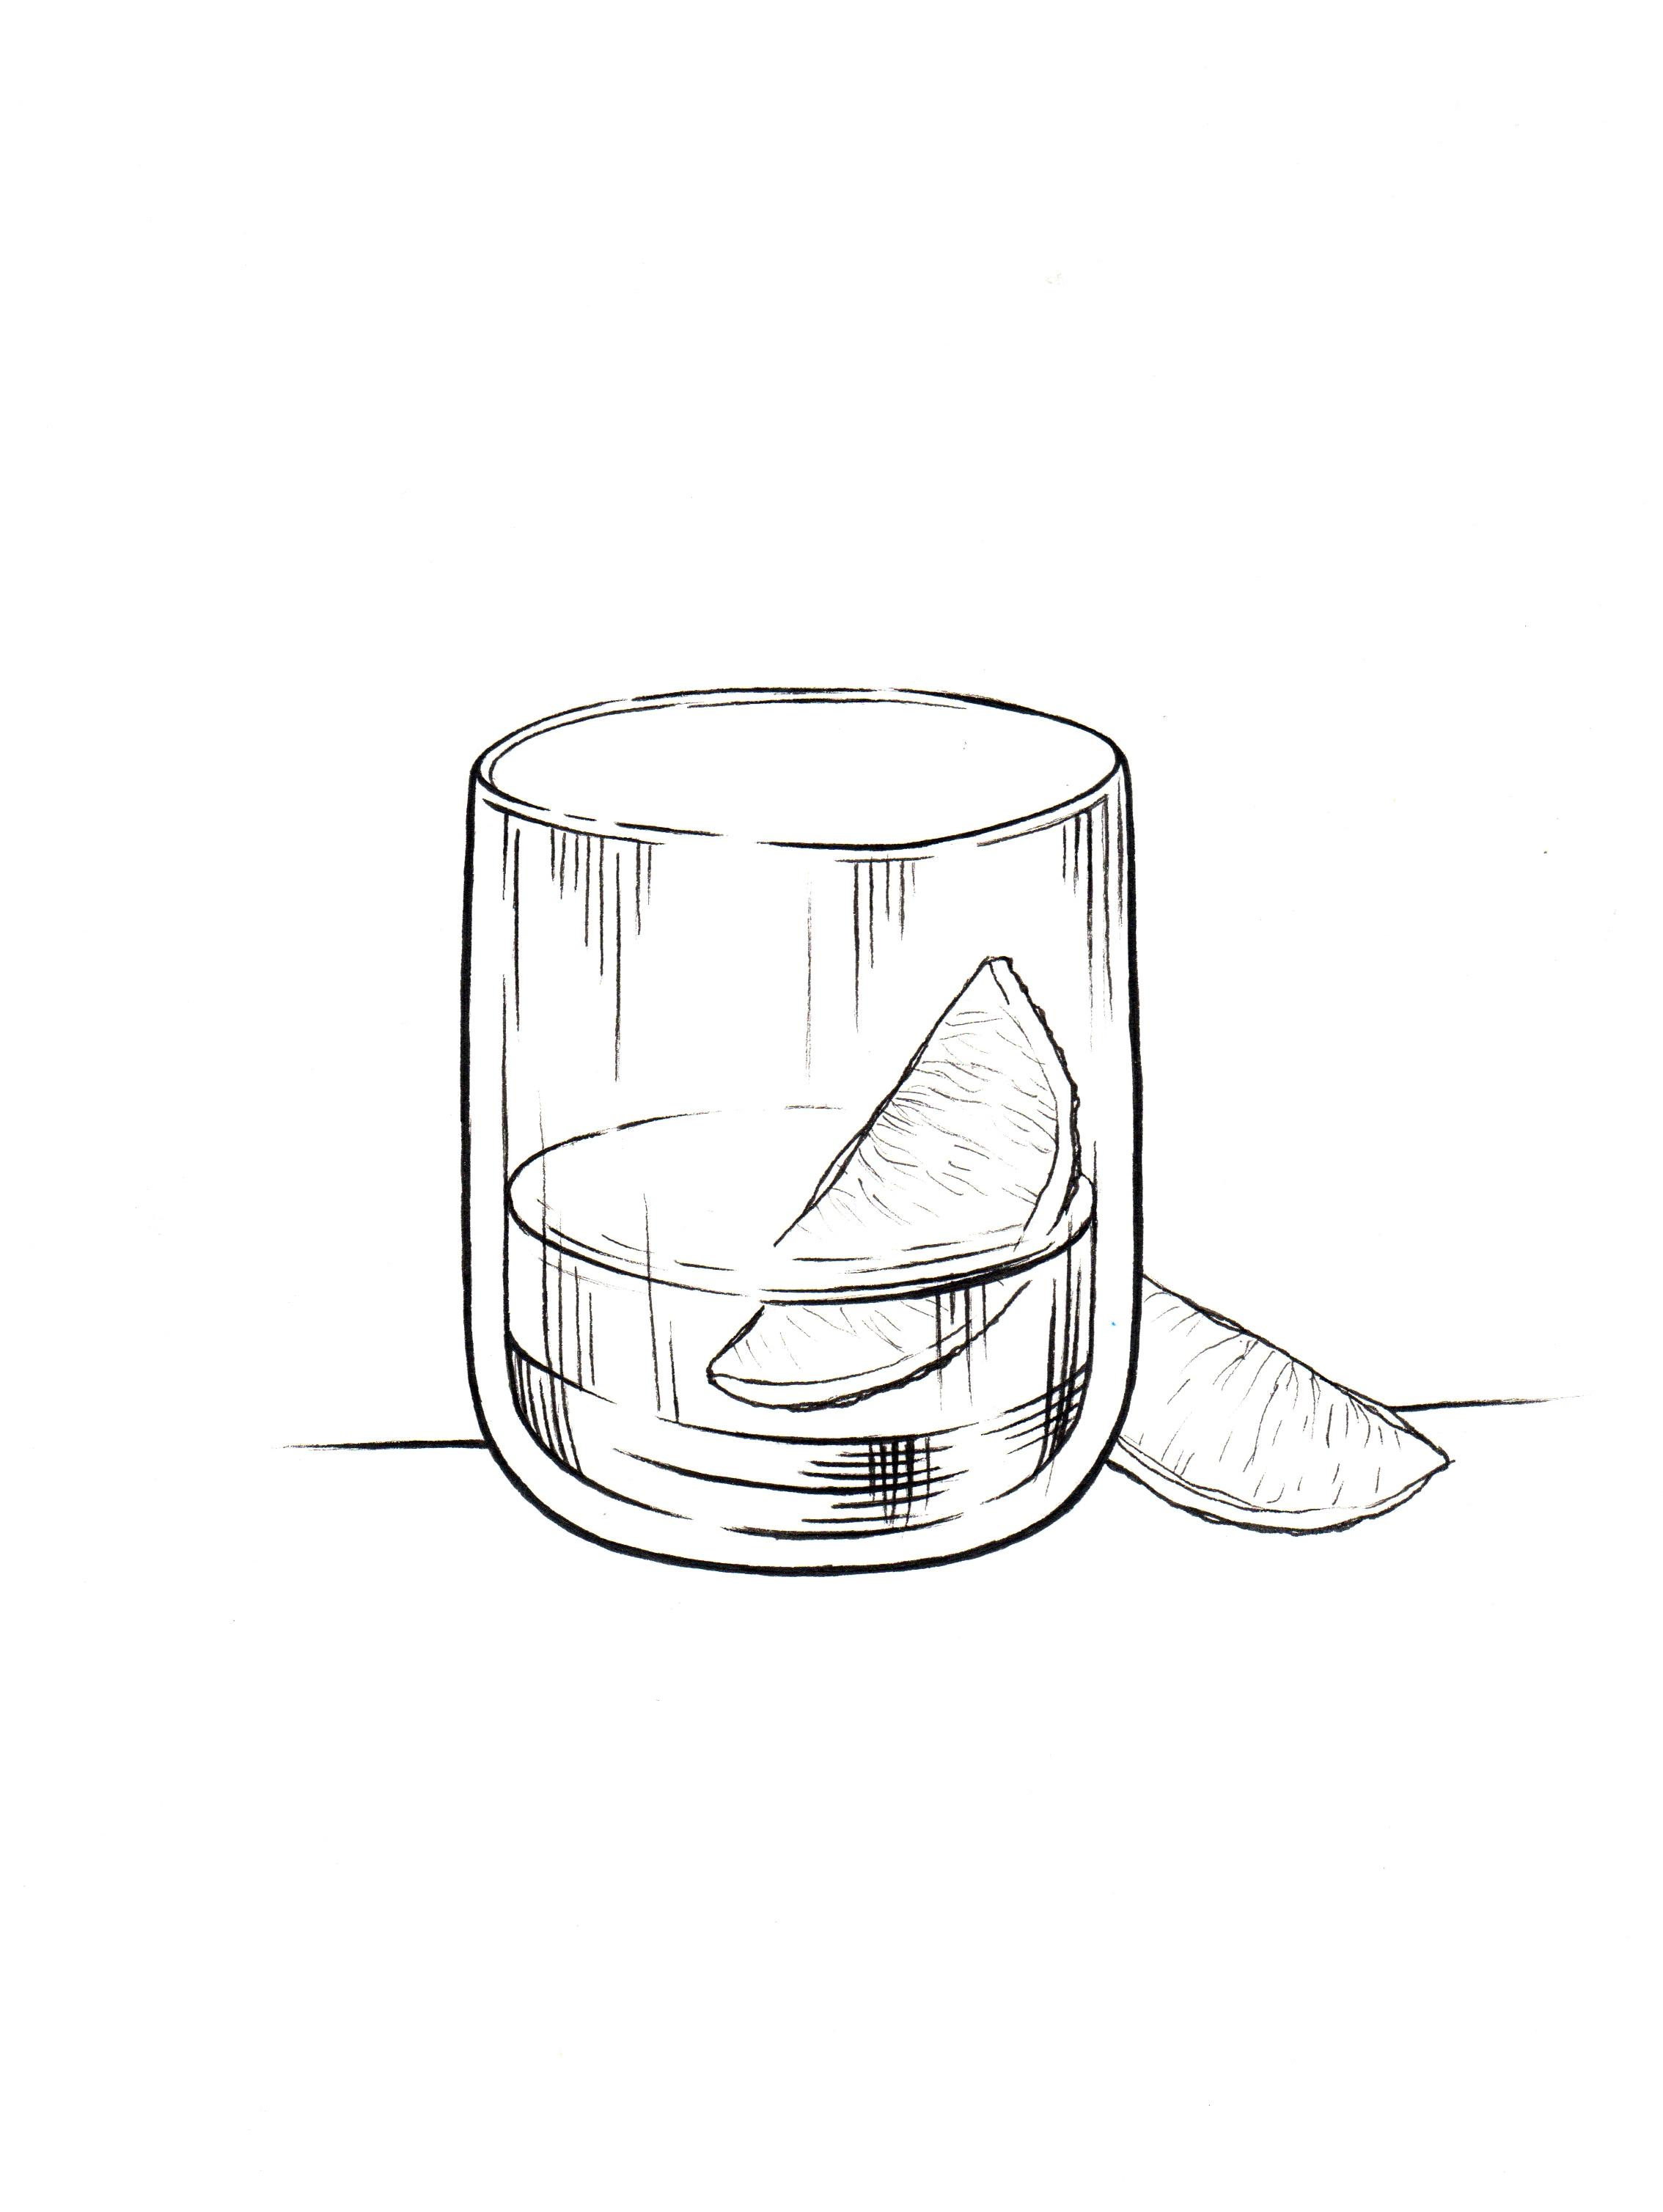 poetry_illustrations_0008.jpg